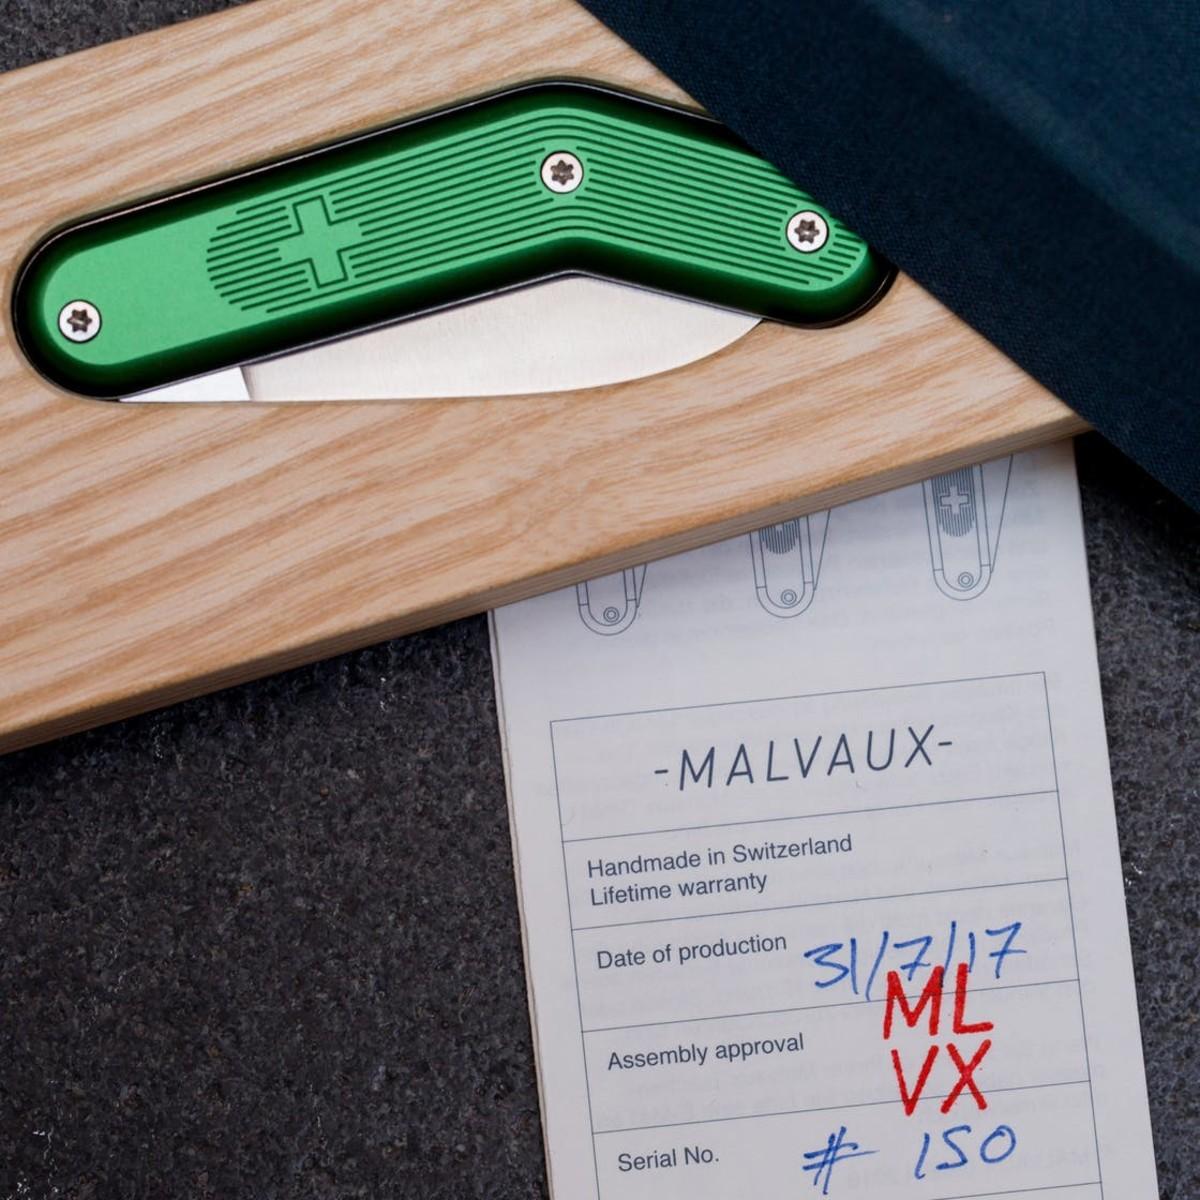 Malvaux